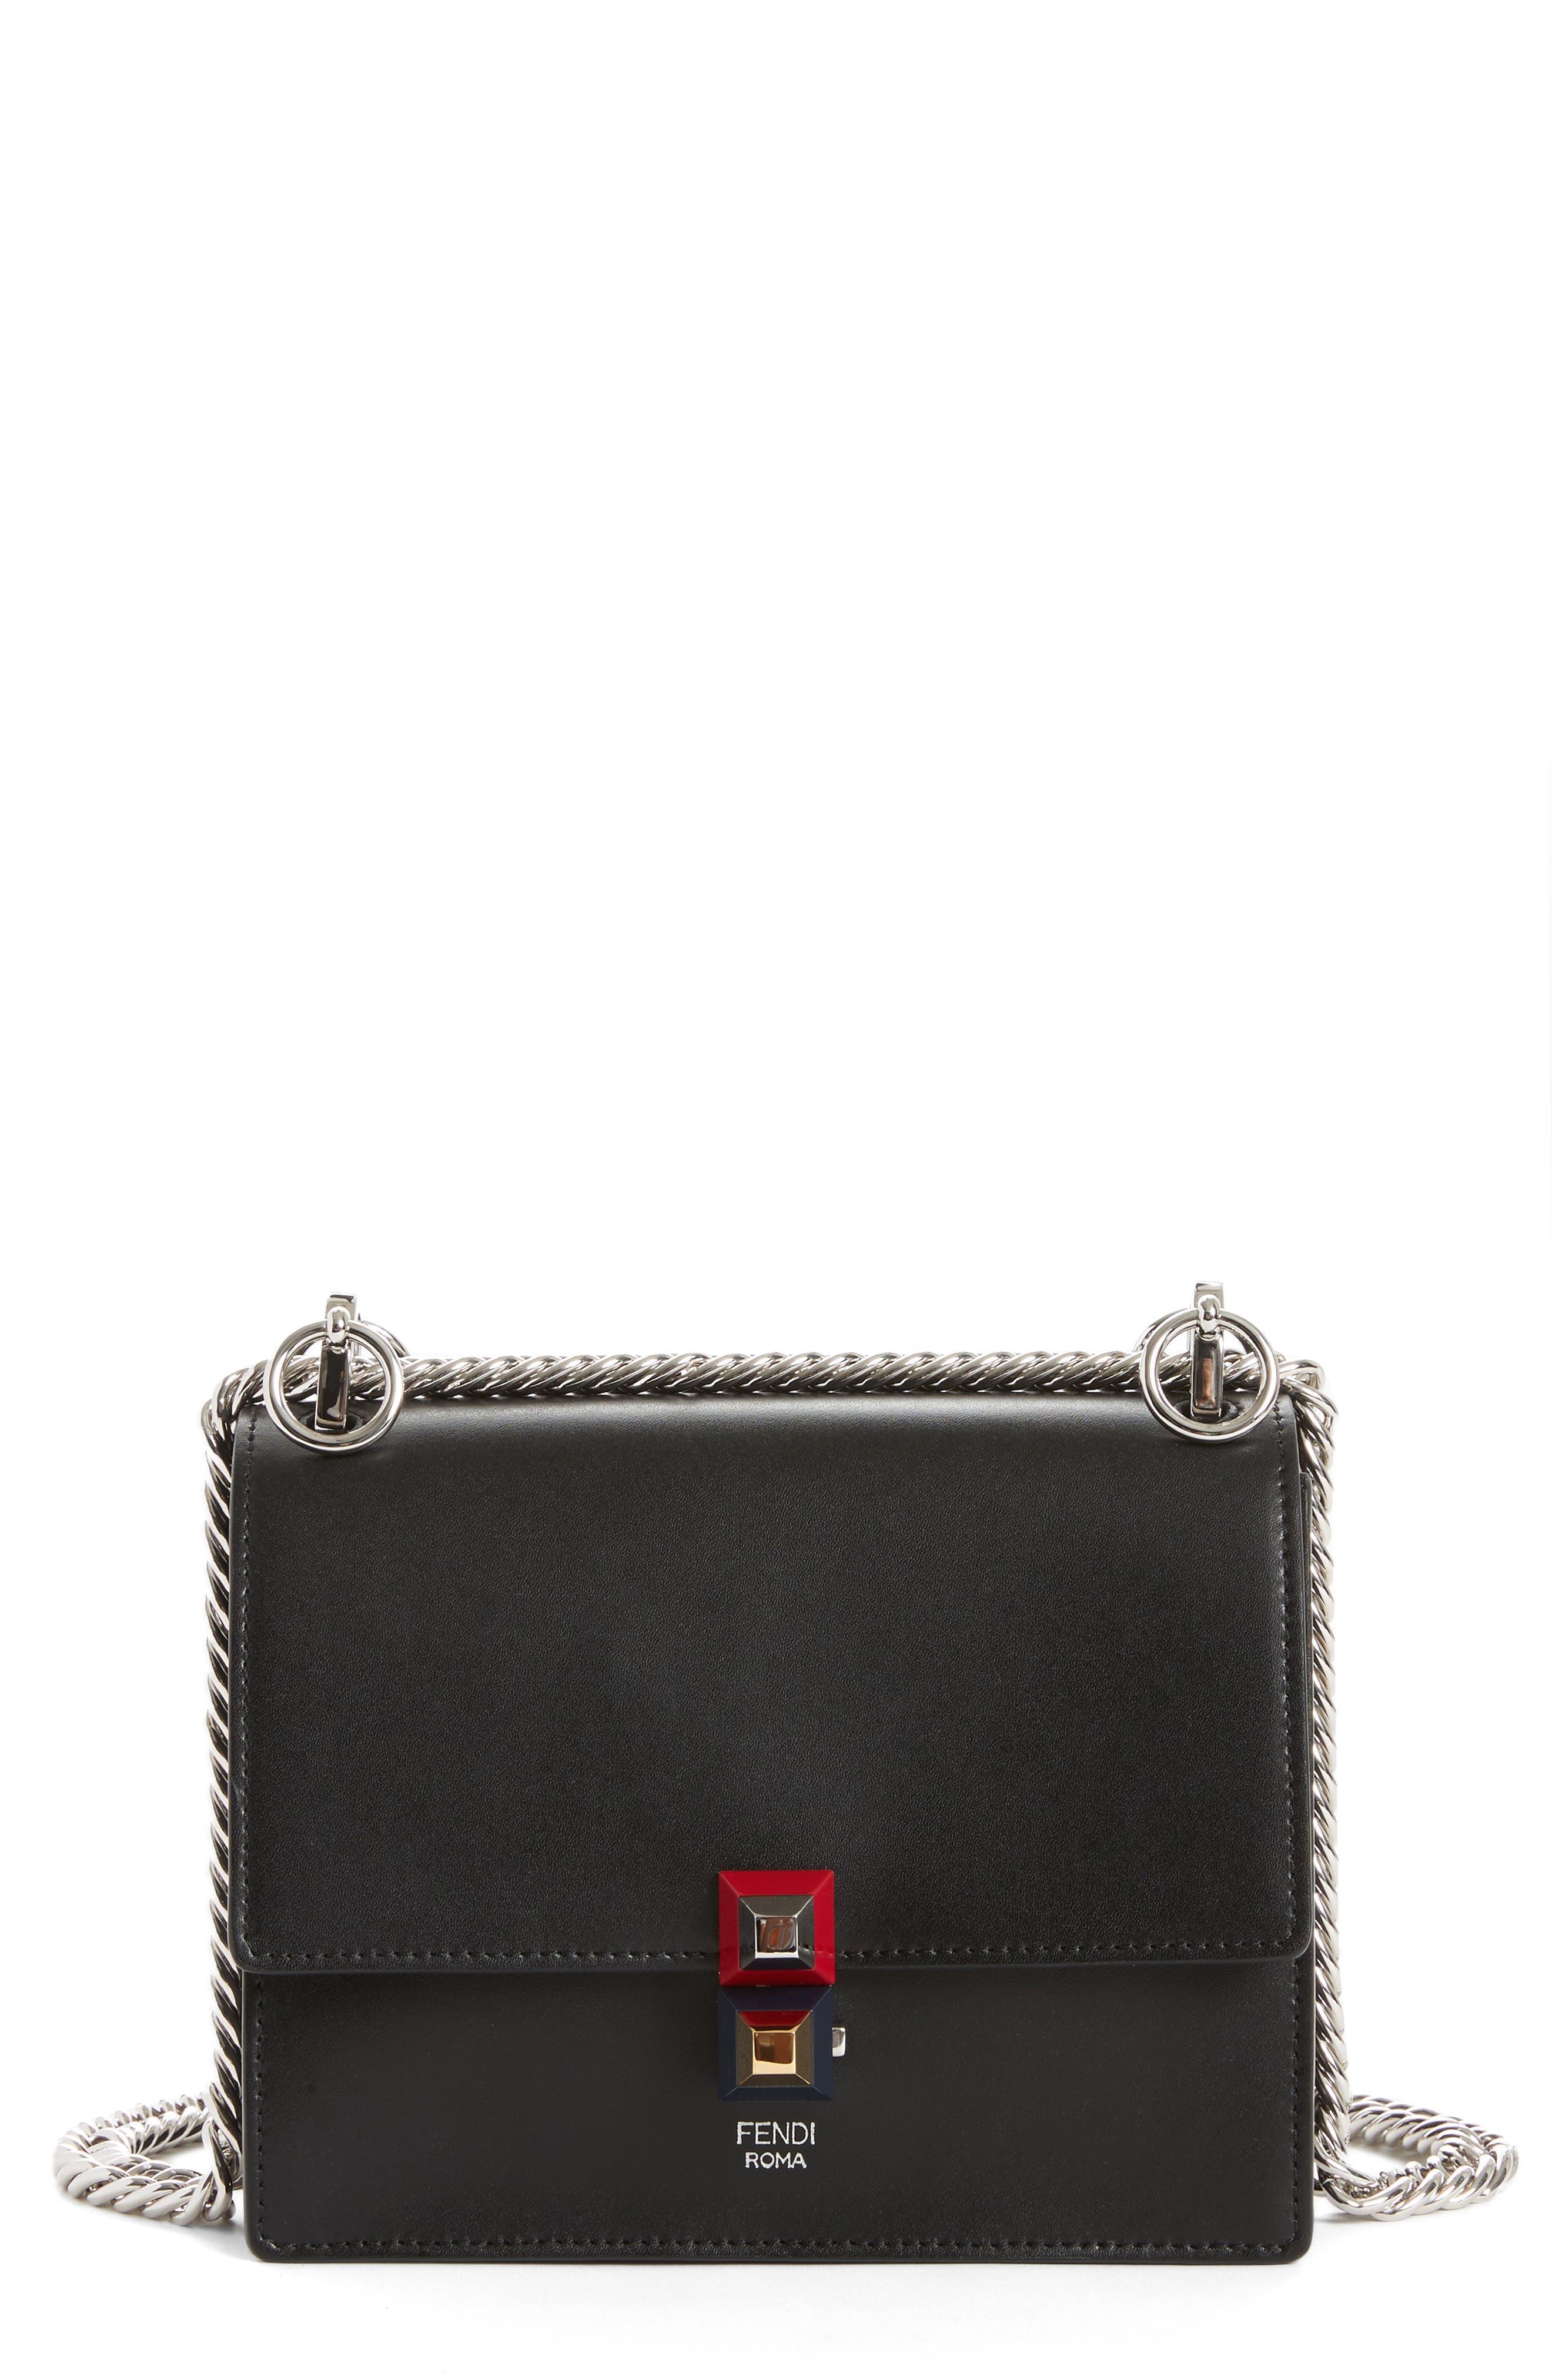 Small Kan I Leather Bag,                             Main thumbnail 1, color,                             NERO